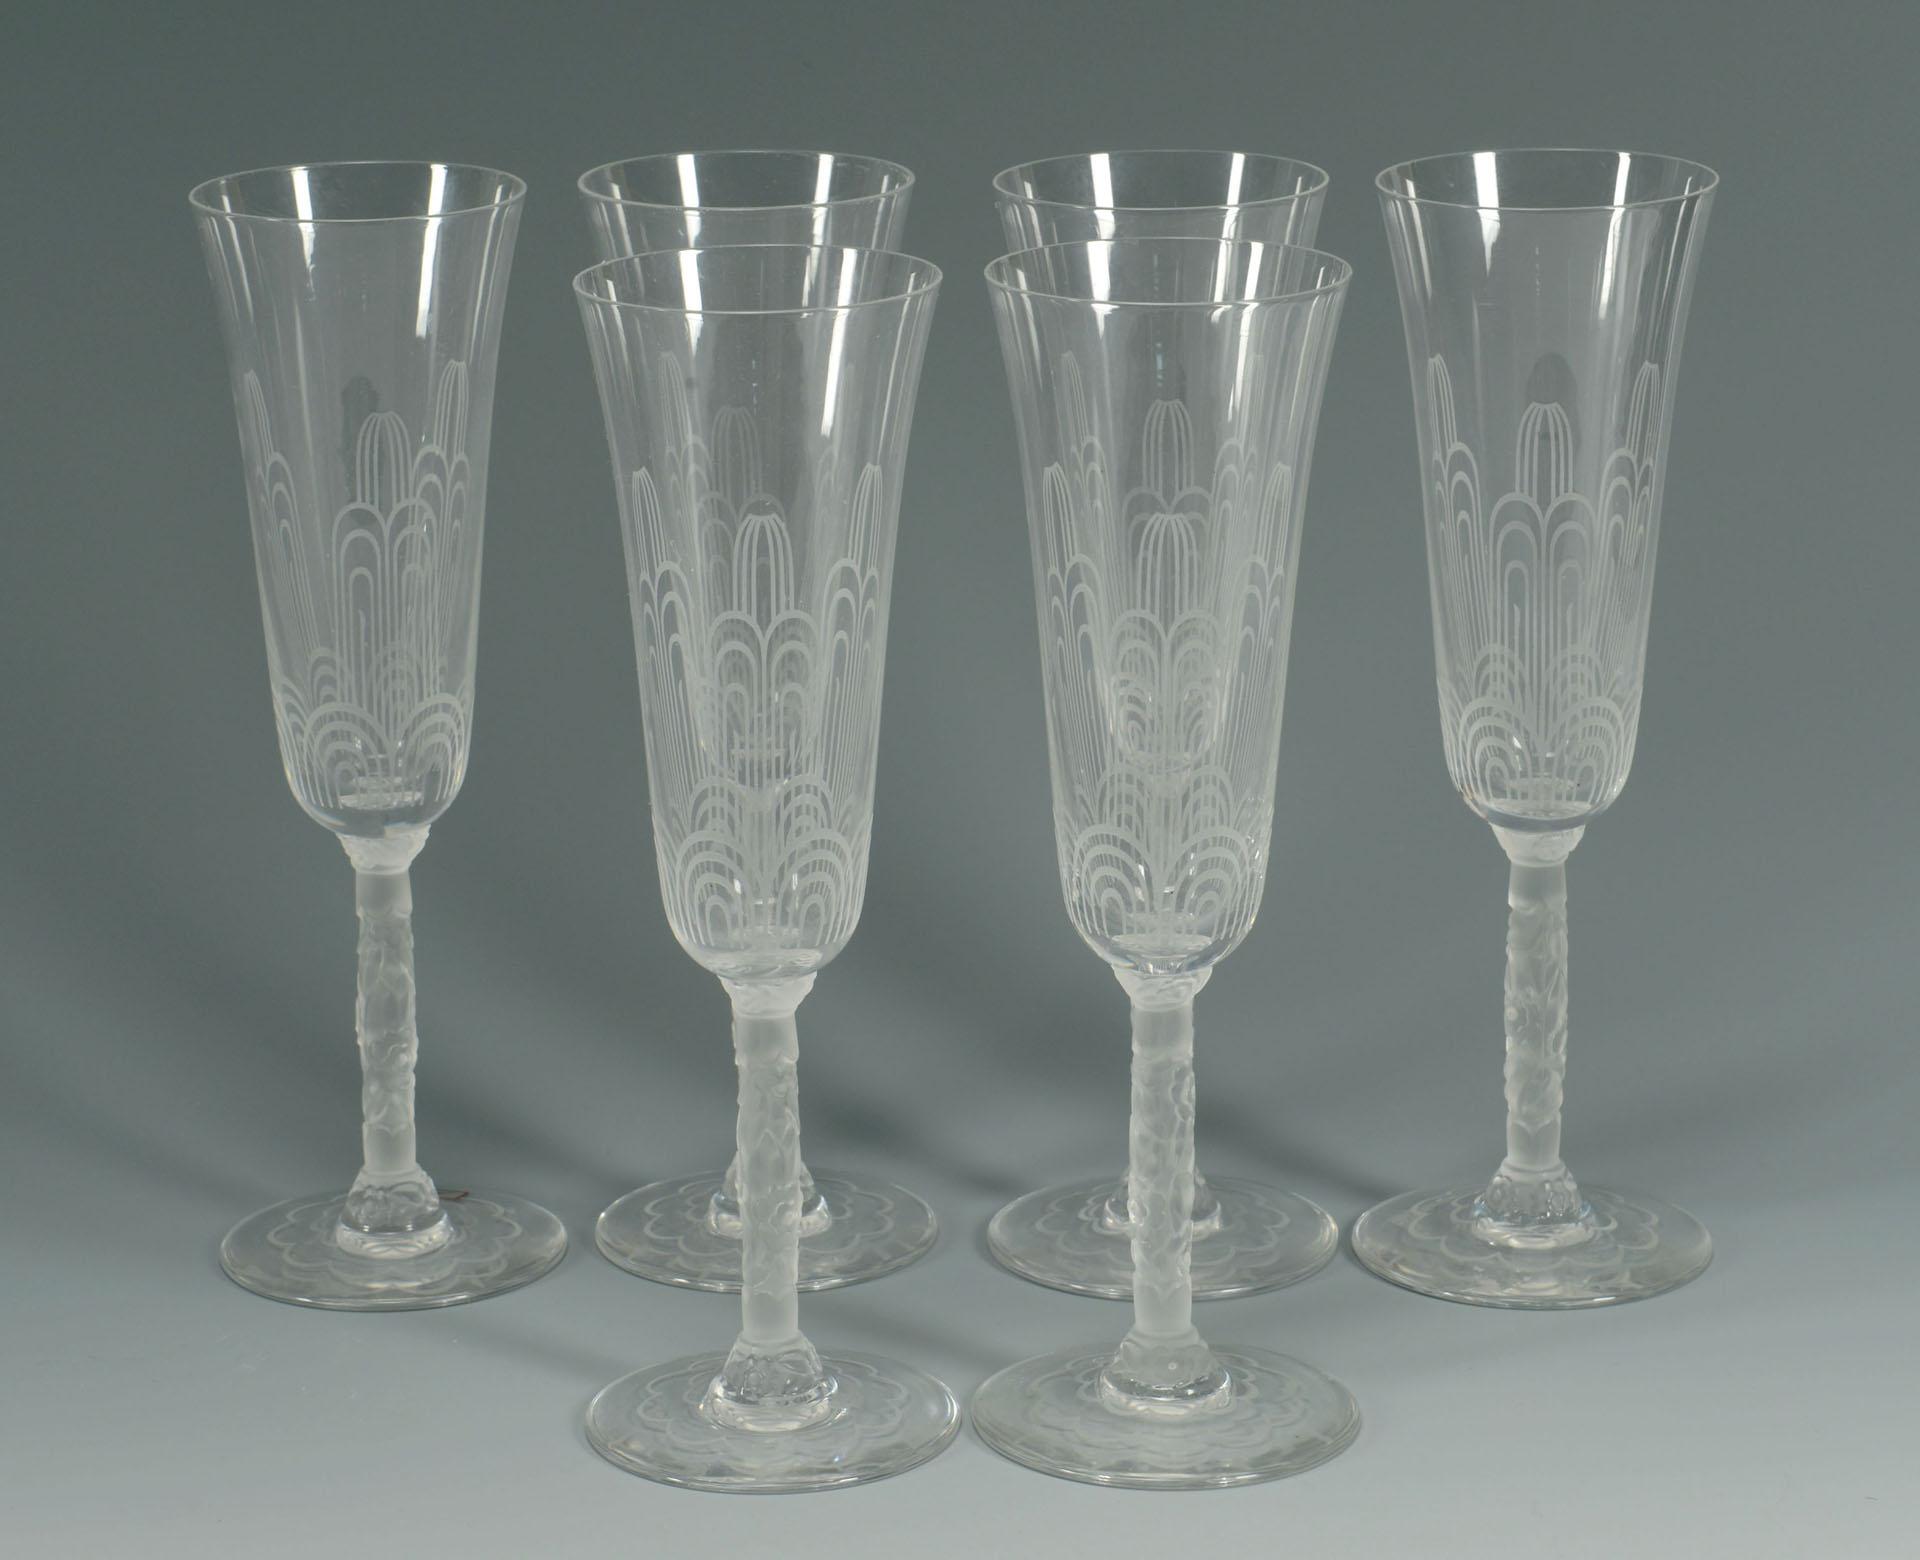 Set of 6 baccarat crystal champagne glasses - Baccarat stemware ...